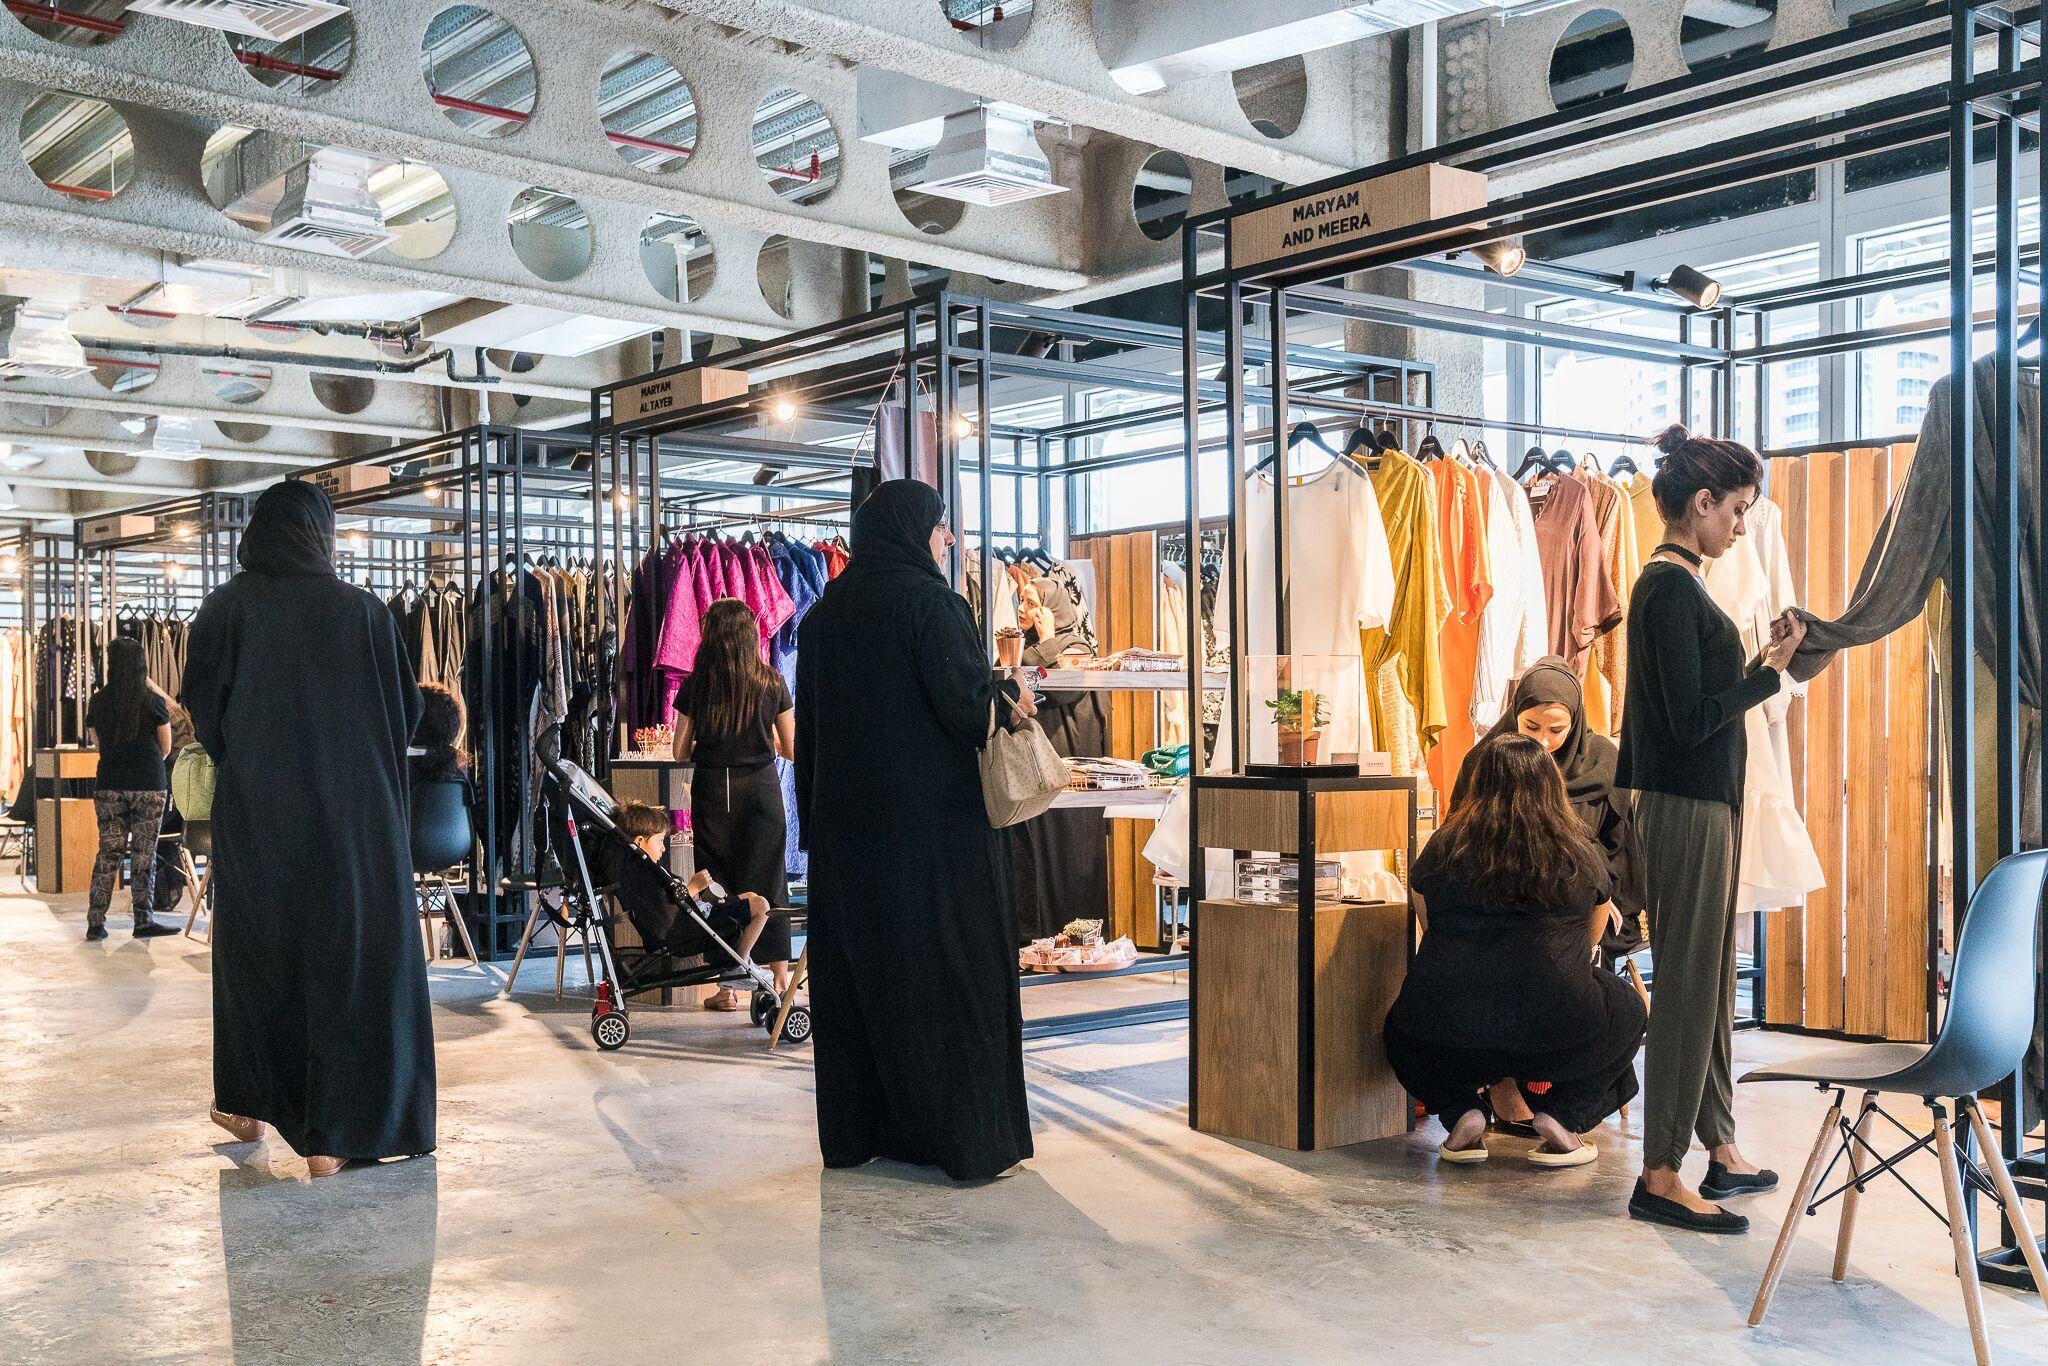 For Many Muslim Women, Ramadan's Celebrations Require a Whole New Wardrobe